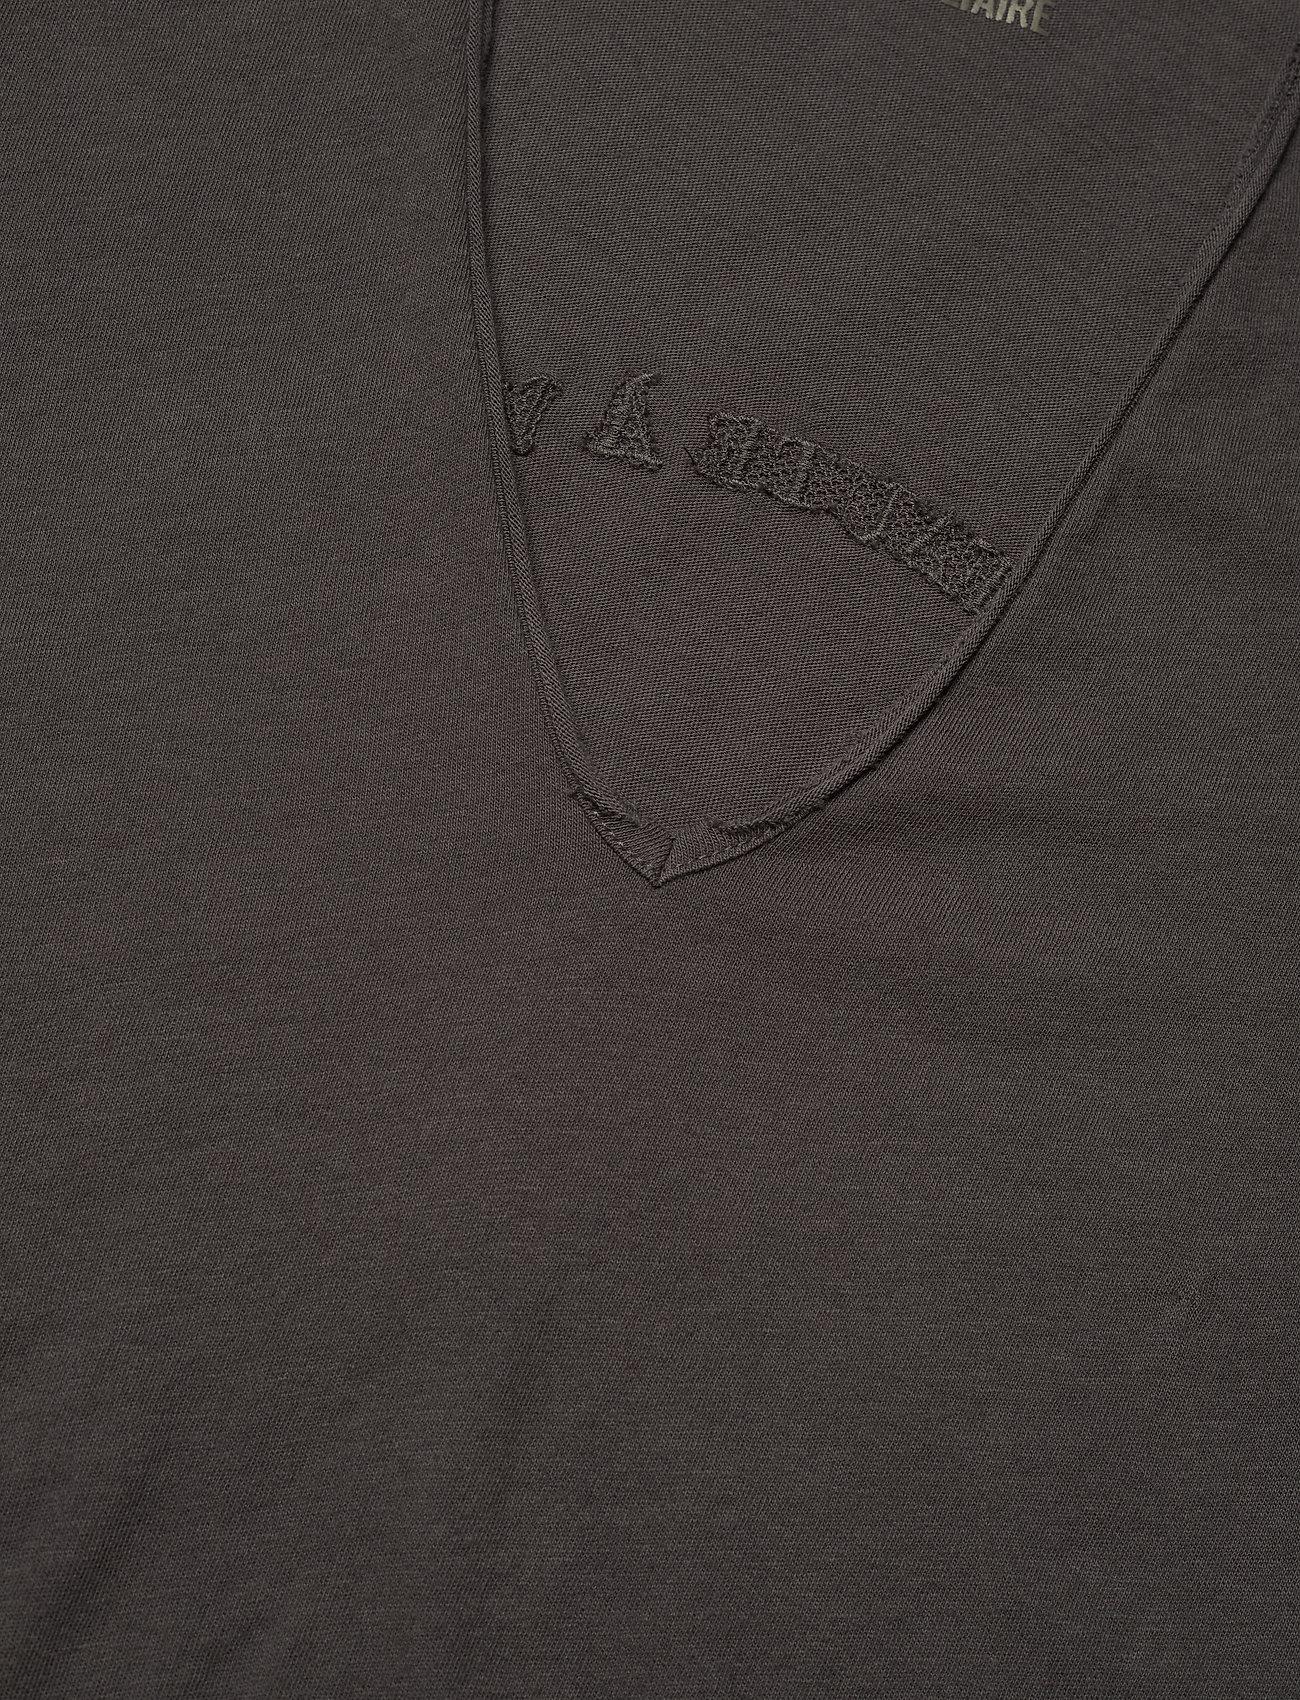 Zadig & Voltaire - STORY FISHNET V-NECK COTTON T-SHIRT - t-shirts - carbon - 2